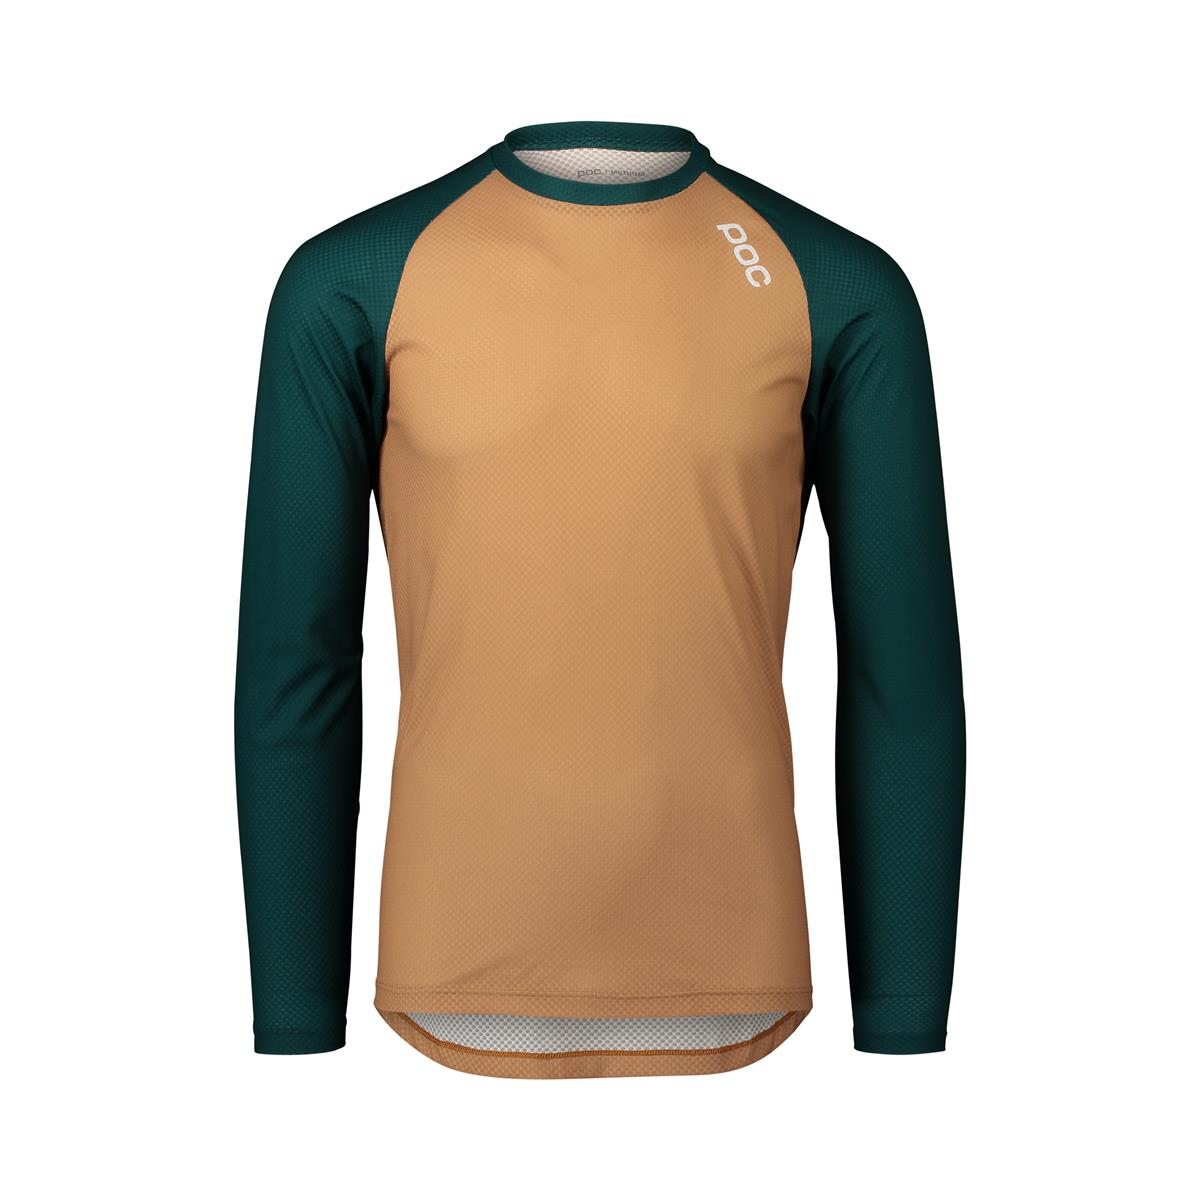 MTB Pure Long Sleeve Jersey Moldanite Green/Aragonite Brown Size XS